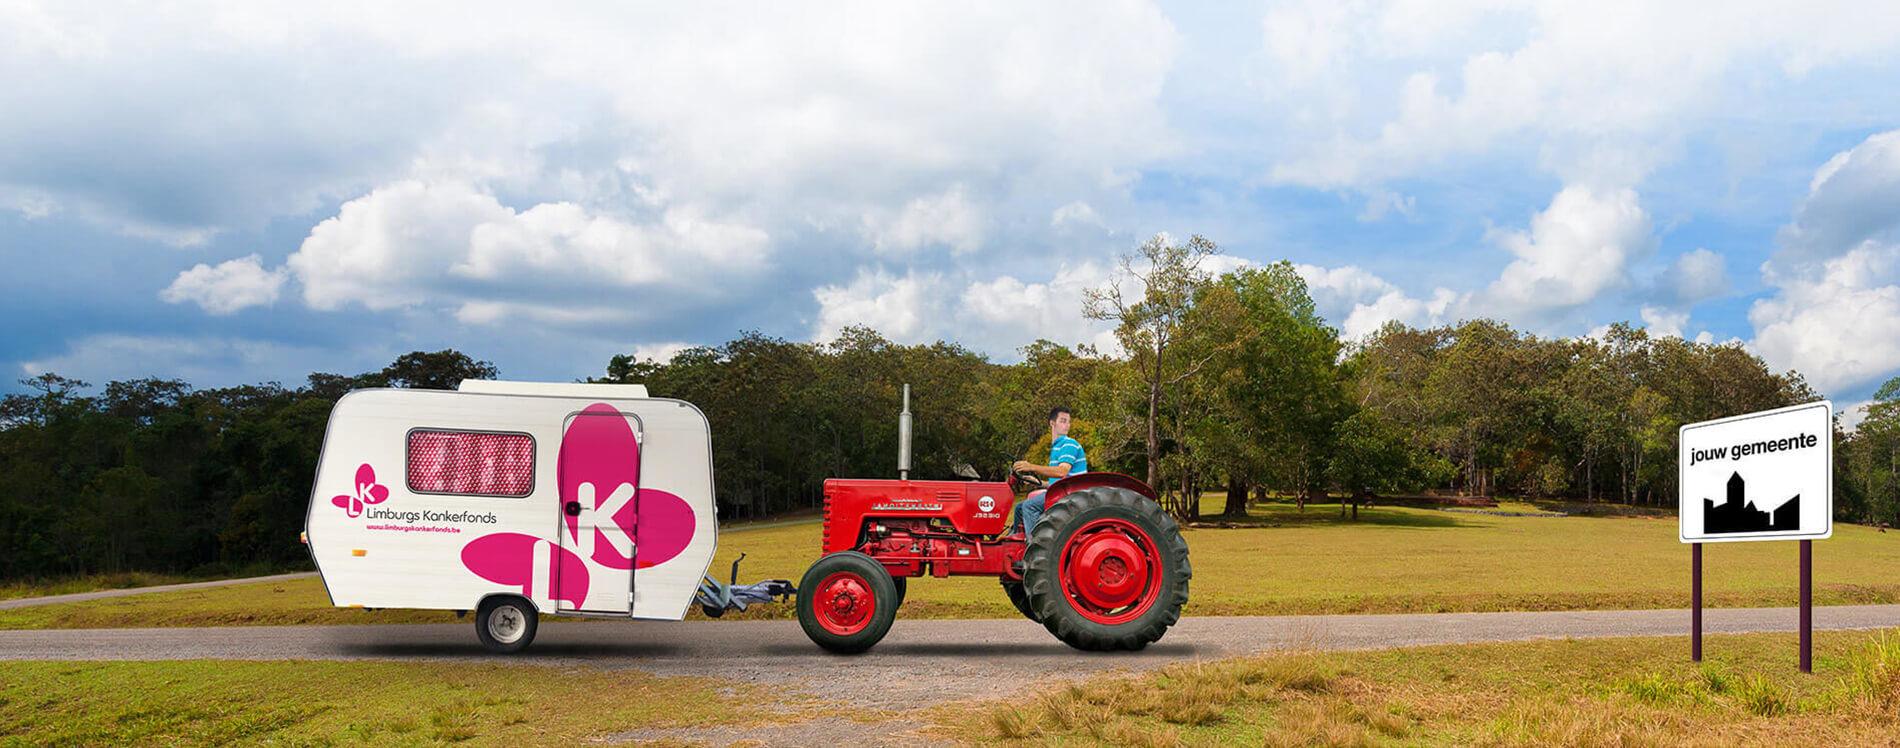 Lika Caravan tractor